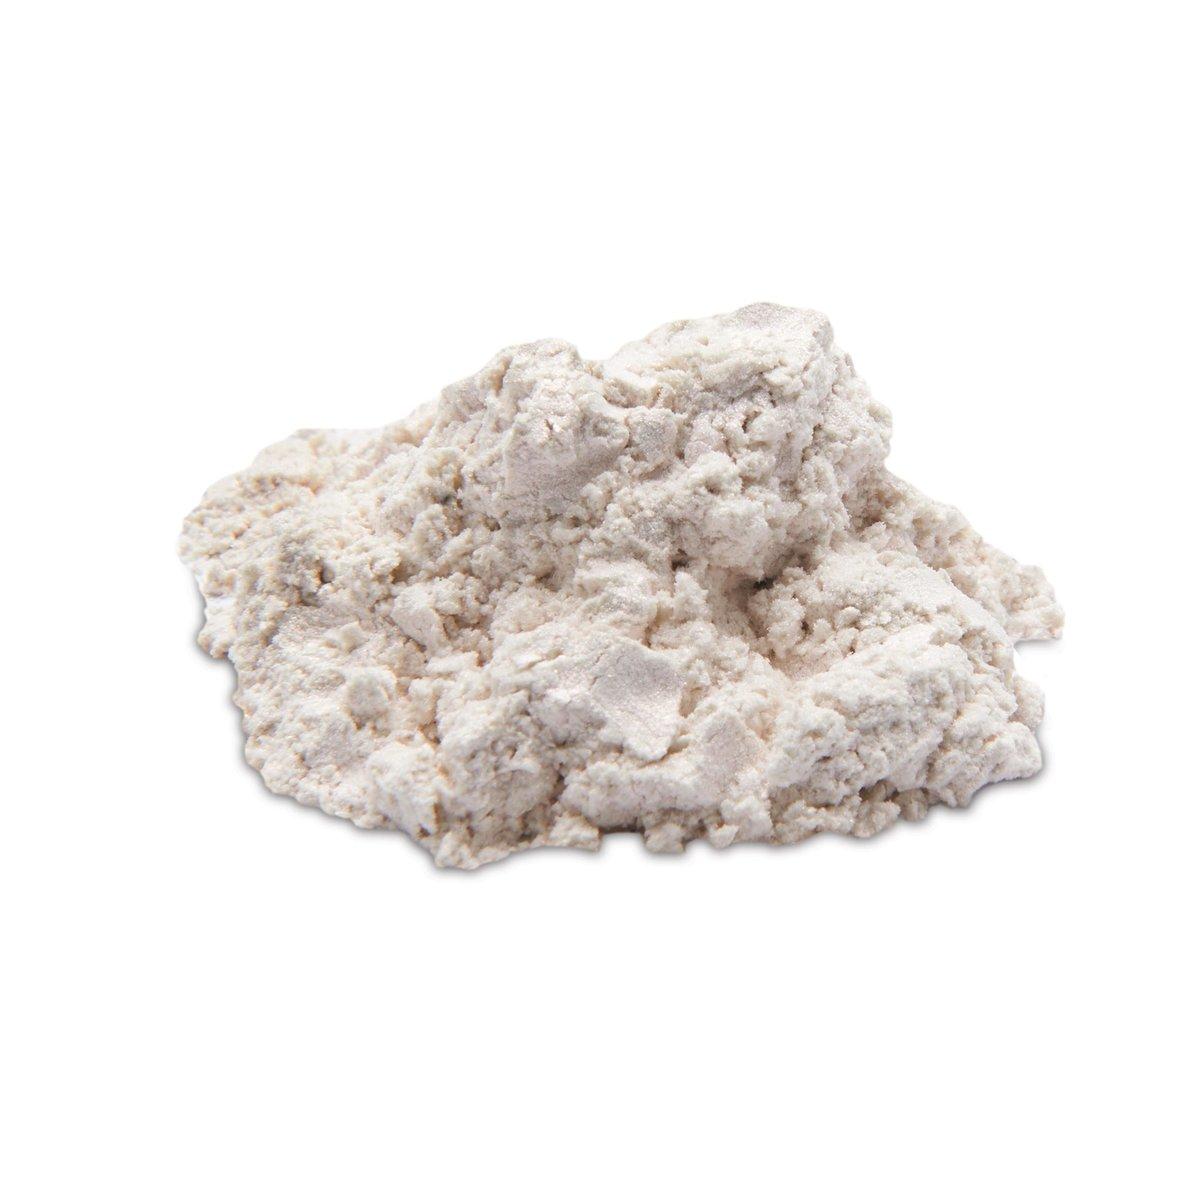 View a Larger Image of PolyColor Resin Powder Purple Mountain Metallic 15-Gram